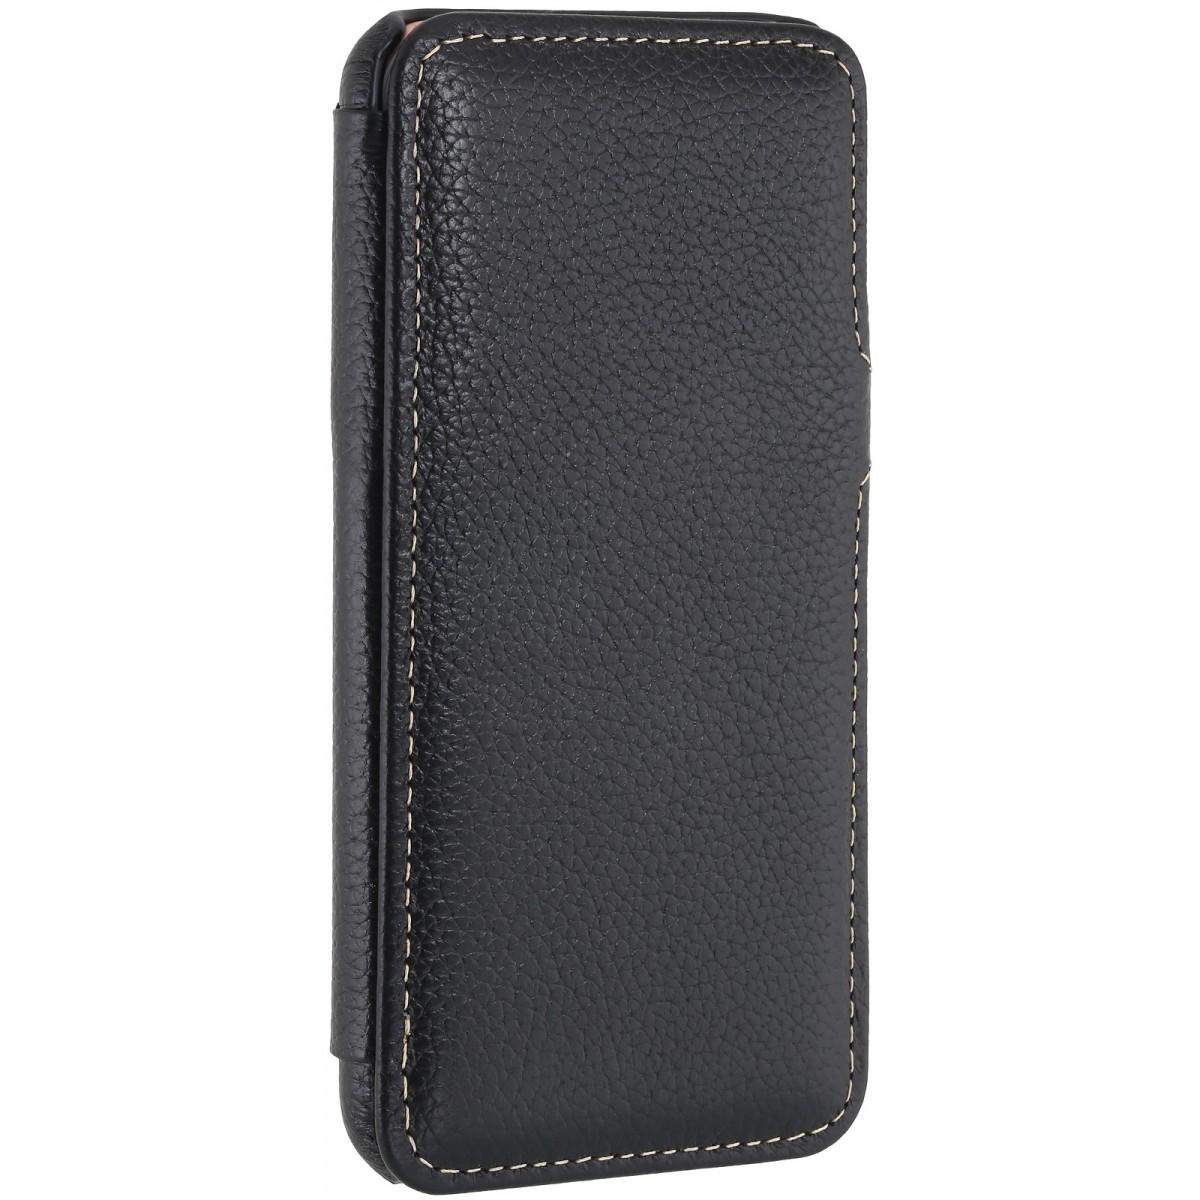 Etui iPhone 7 book type noir en cuir véritable - Stilgut